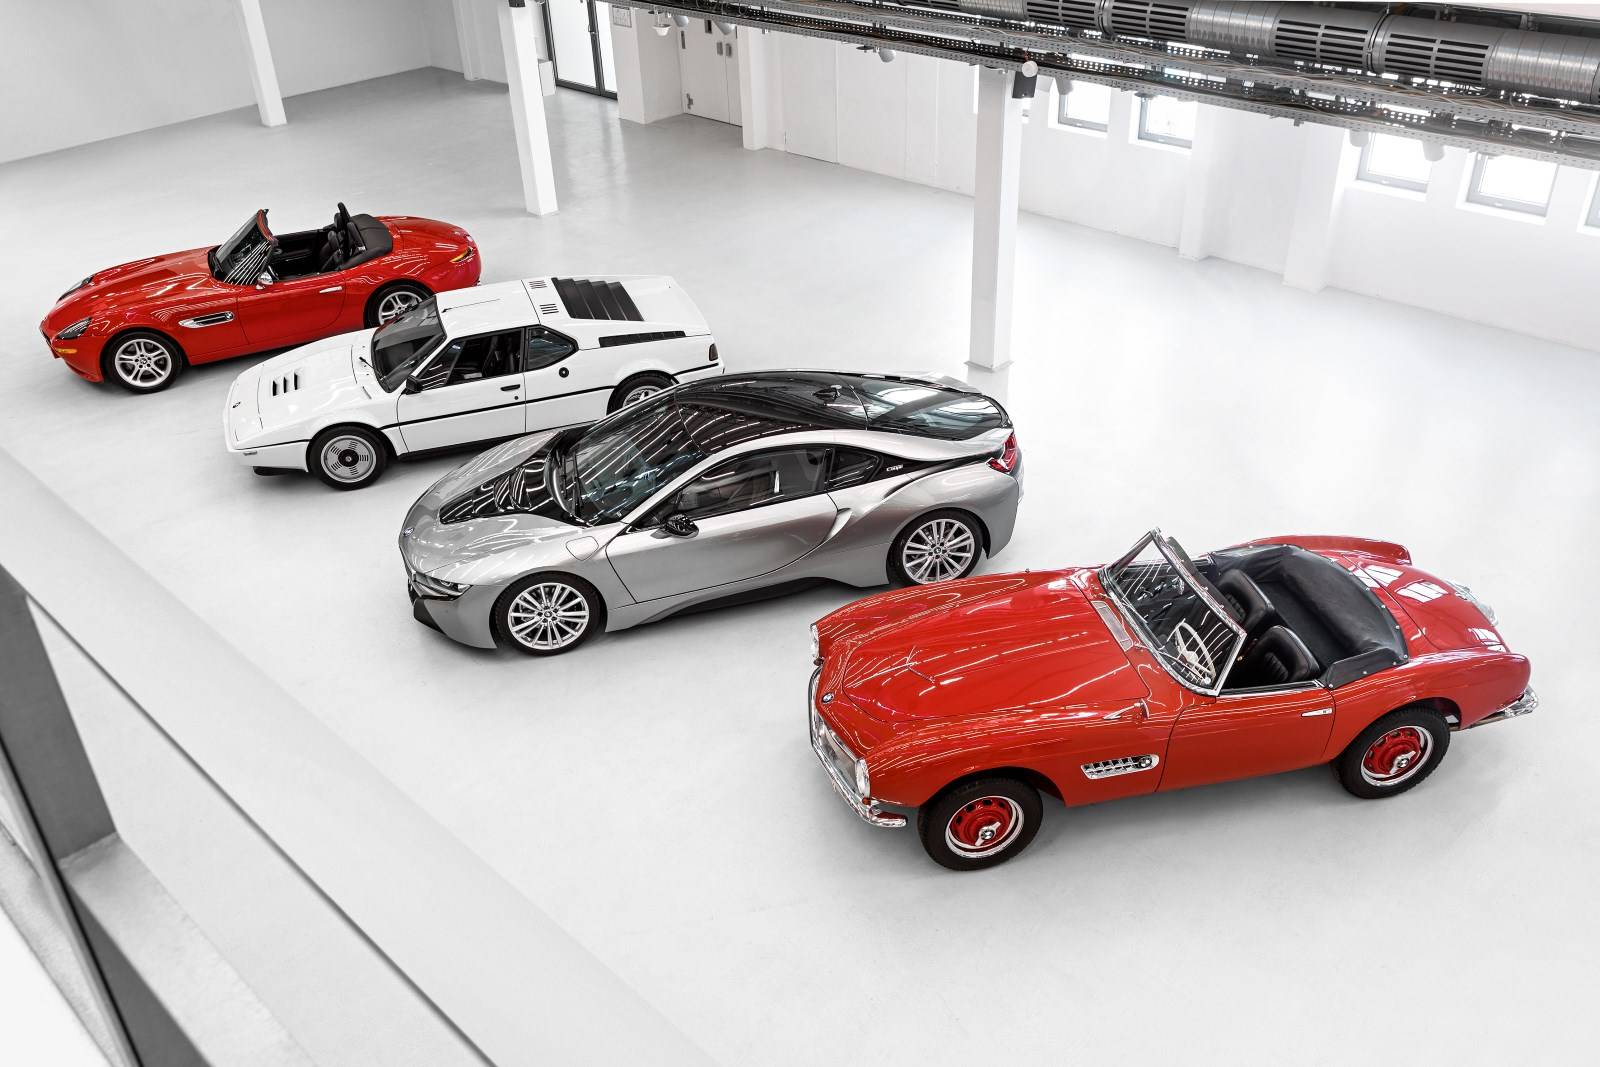 BMW i8 уходит в музей - BMW Group прекращает производство гибрида 3